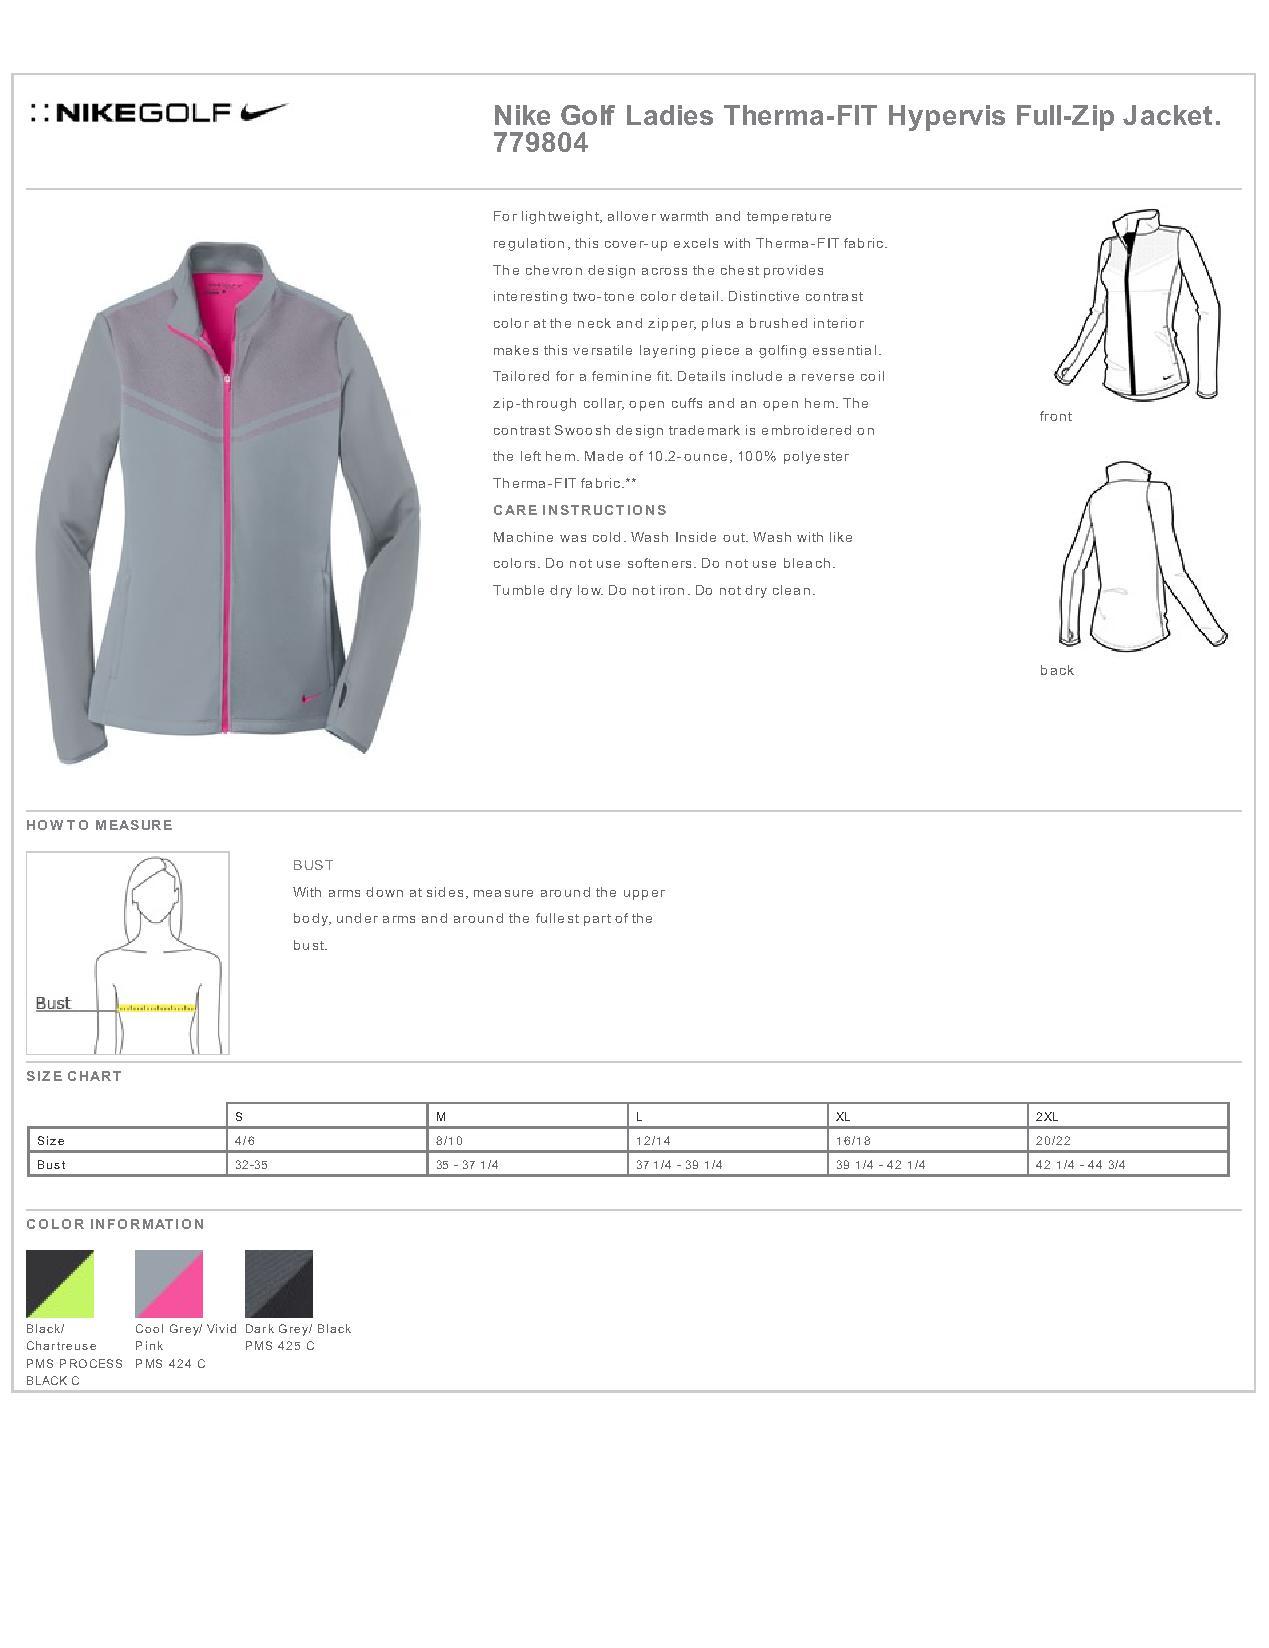 c3b9fdb918aa Nike Golf 779804 - Ladies Therma-FIT Hypervis Full-Zip Jacket ...